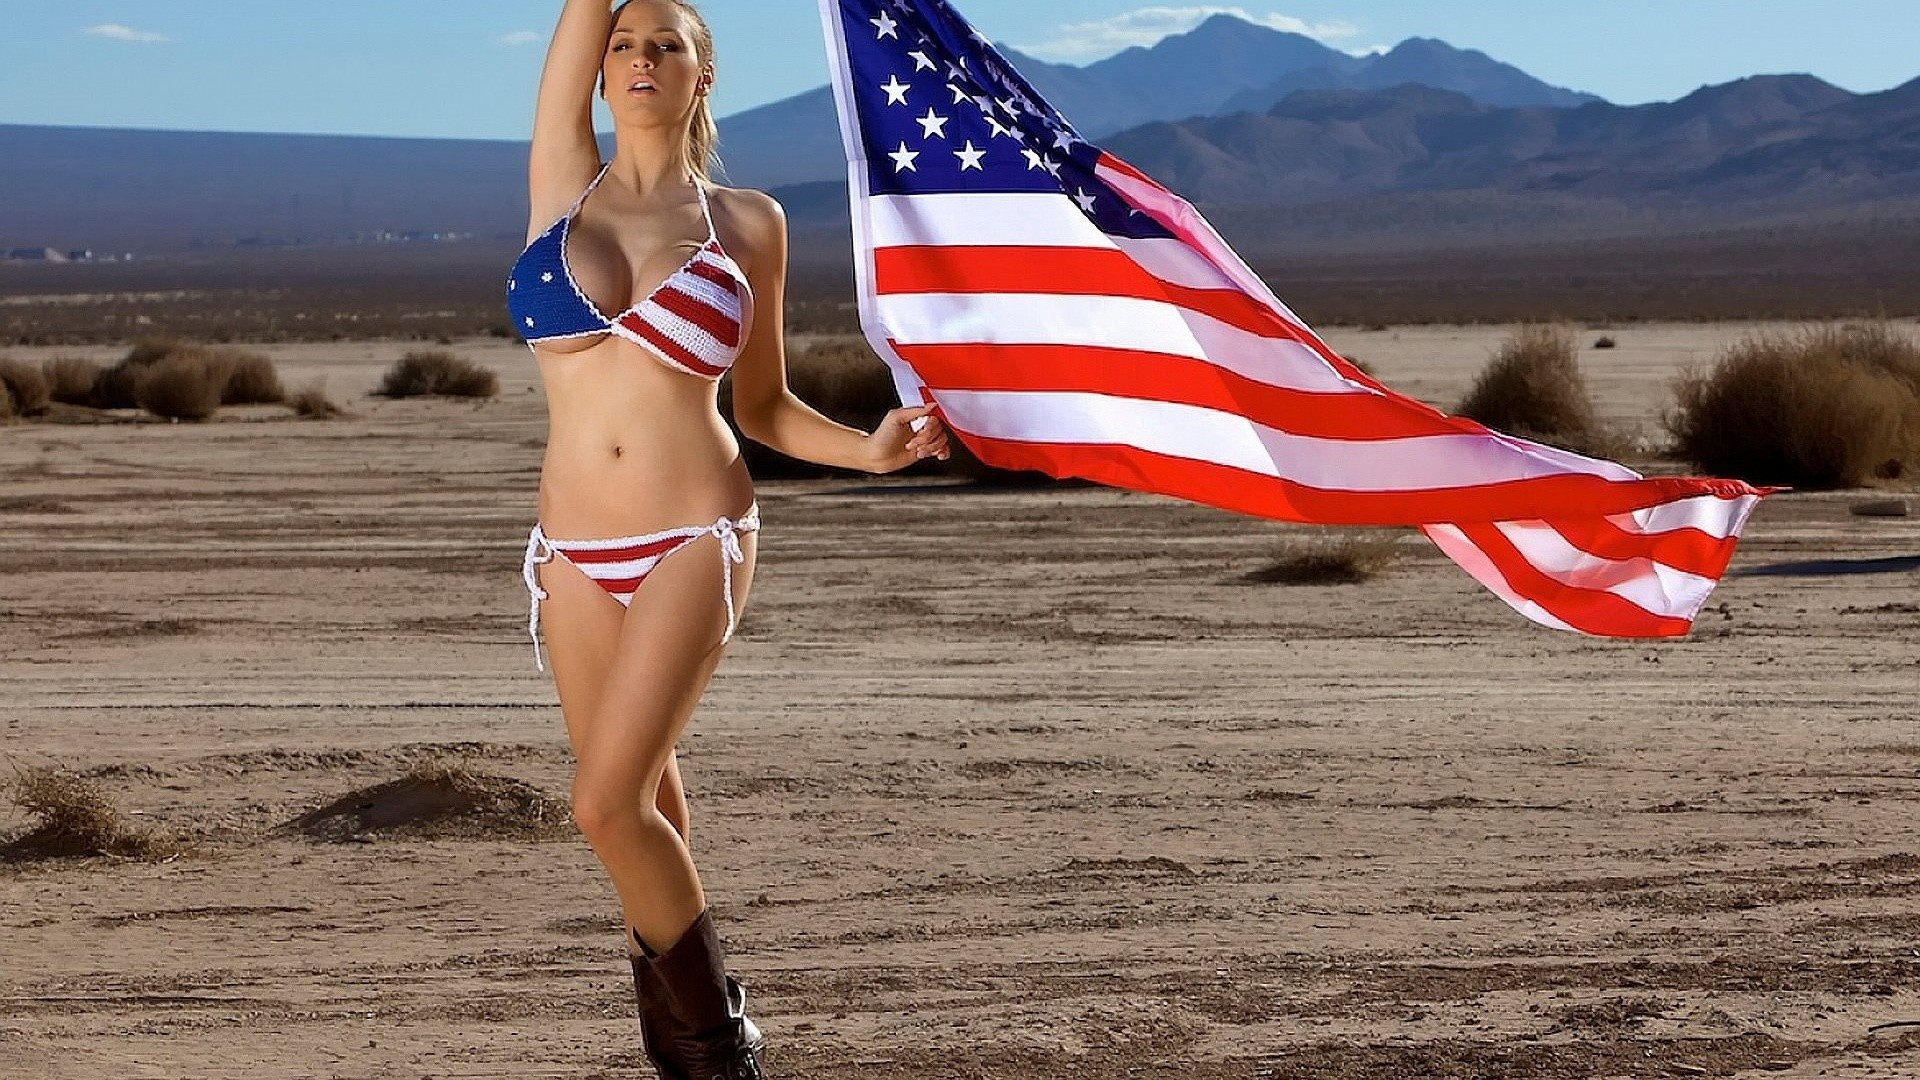 Jordan Carver, American Flag, Bikini, Jordan Carver American Flag Bikini  …